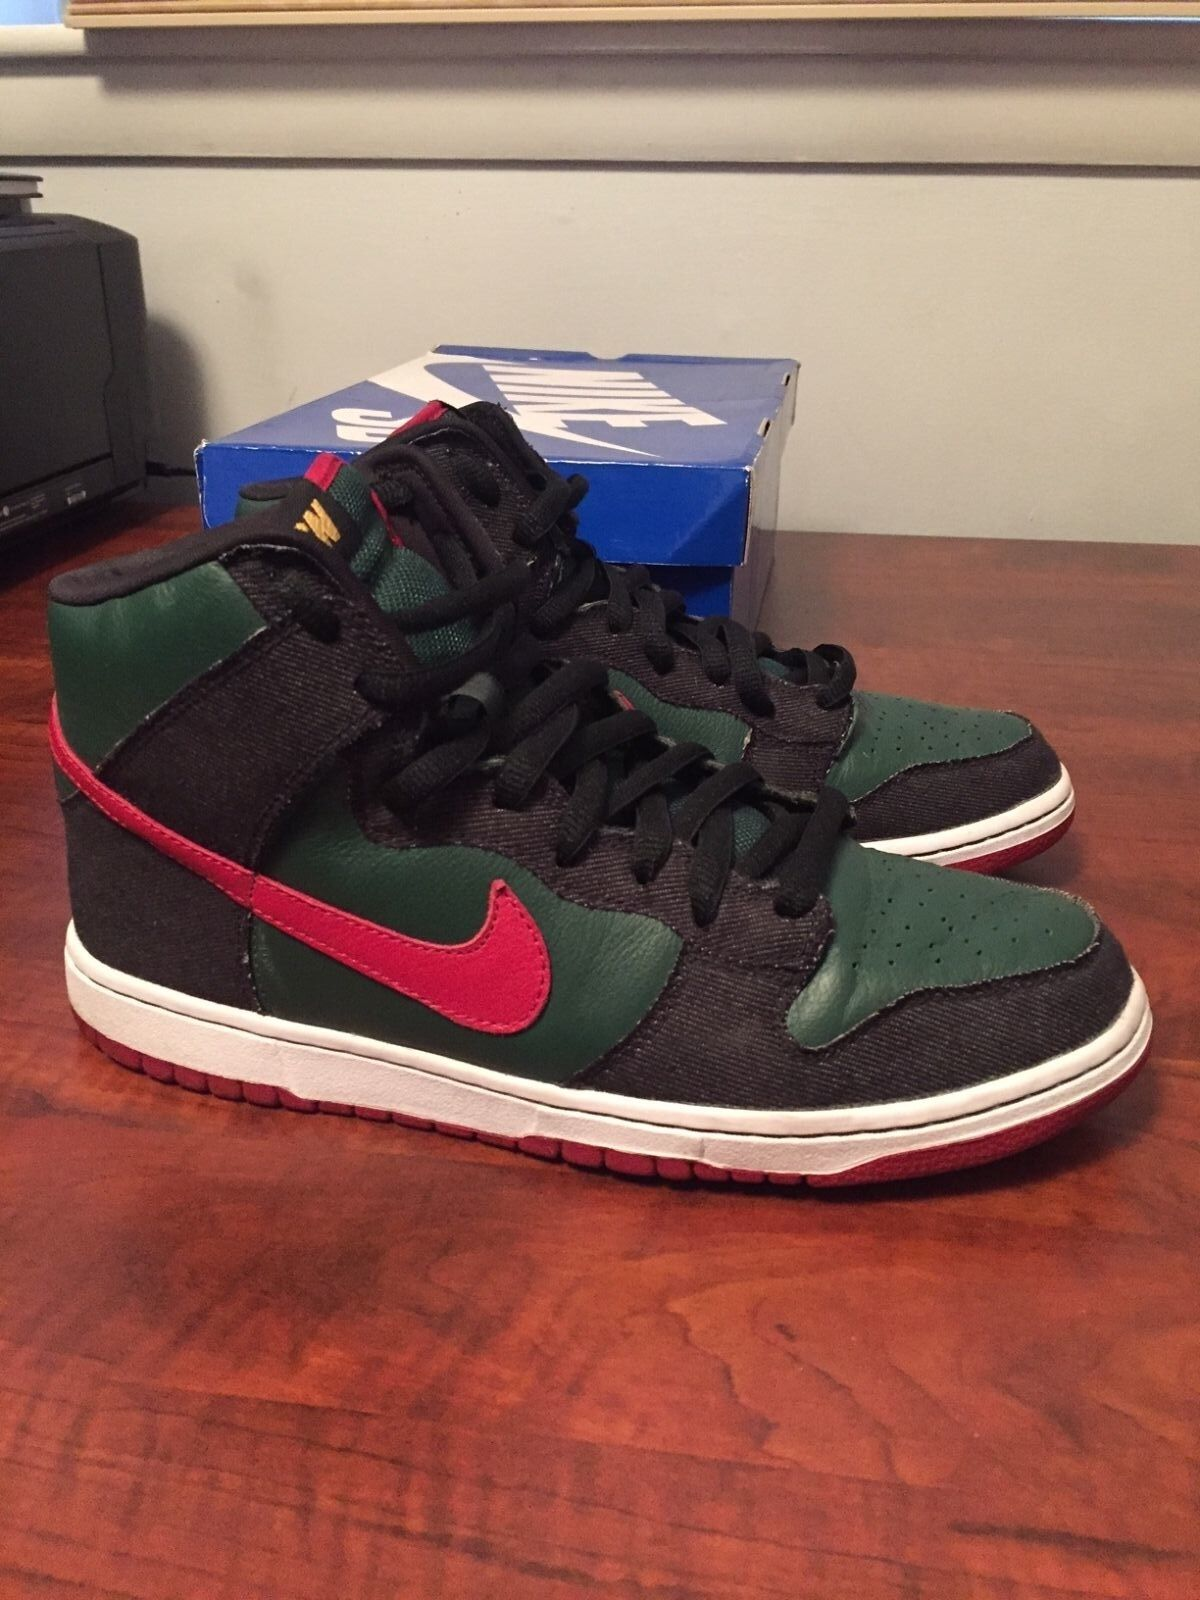 Nike SB Dunk RESN size 11 11 size 99ea64